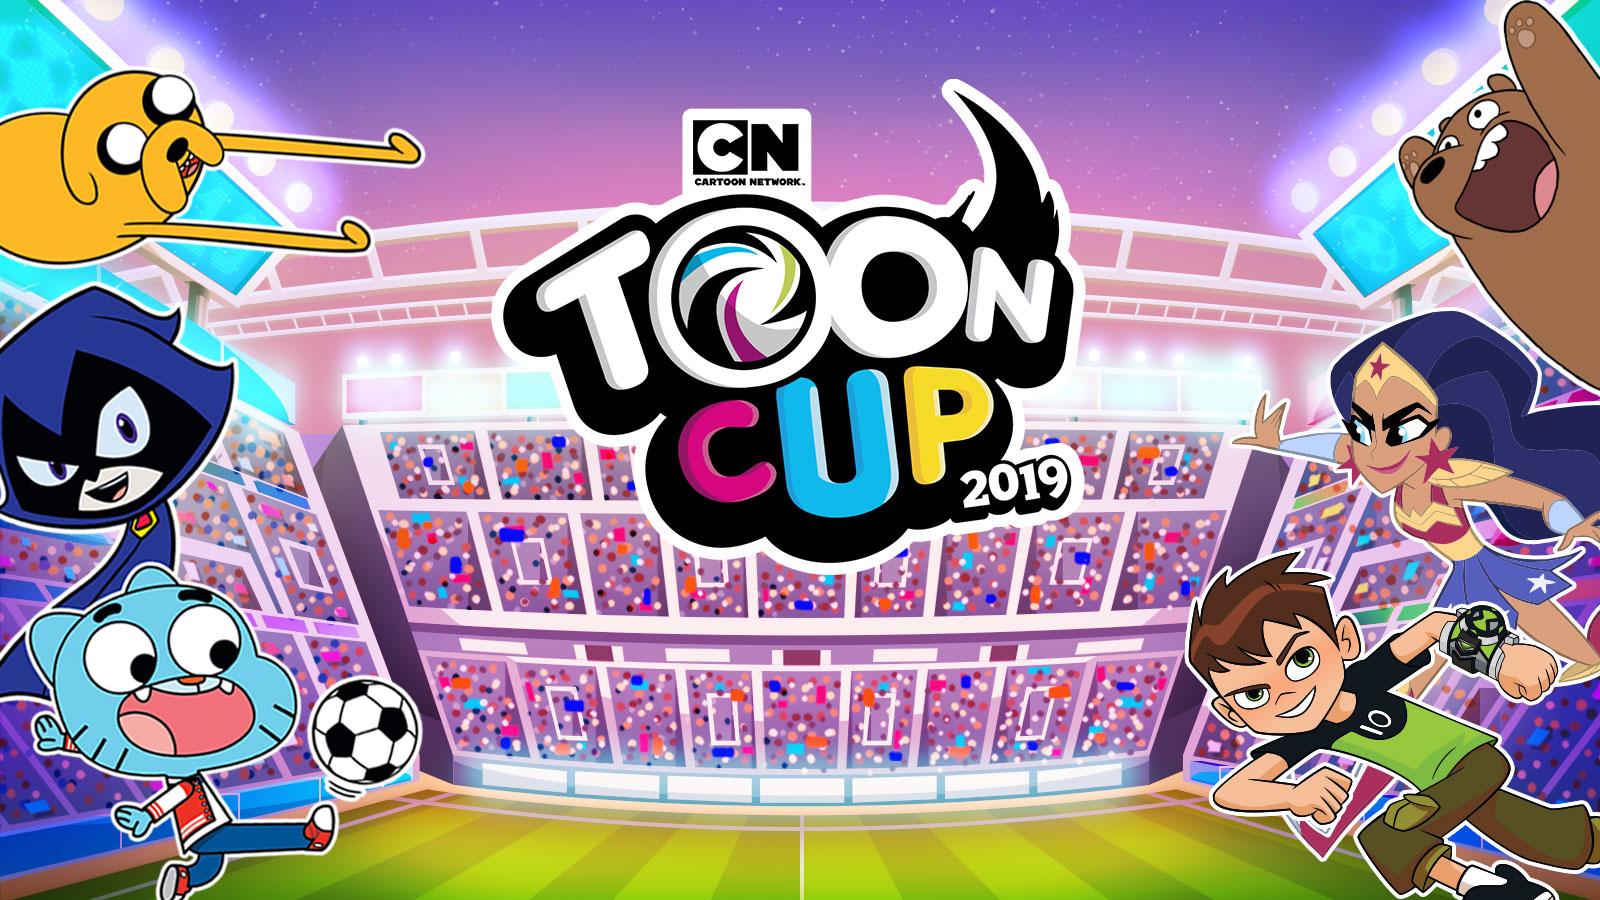 Toon Cup 2019 Football Games Cartoon Network